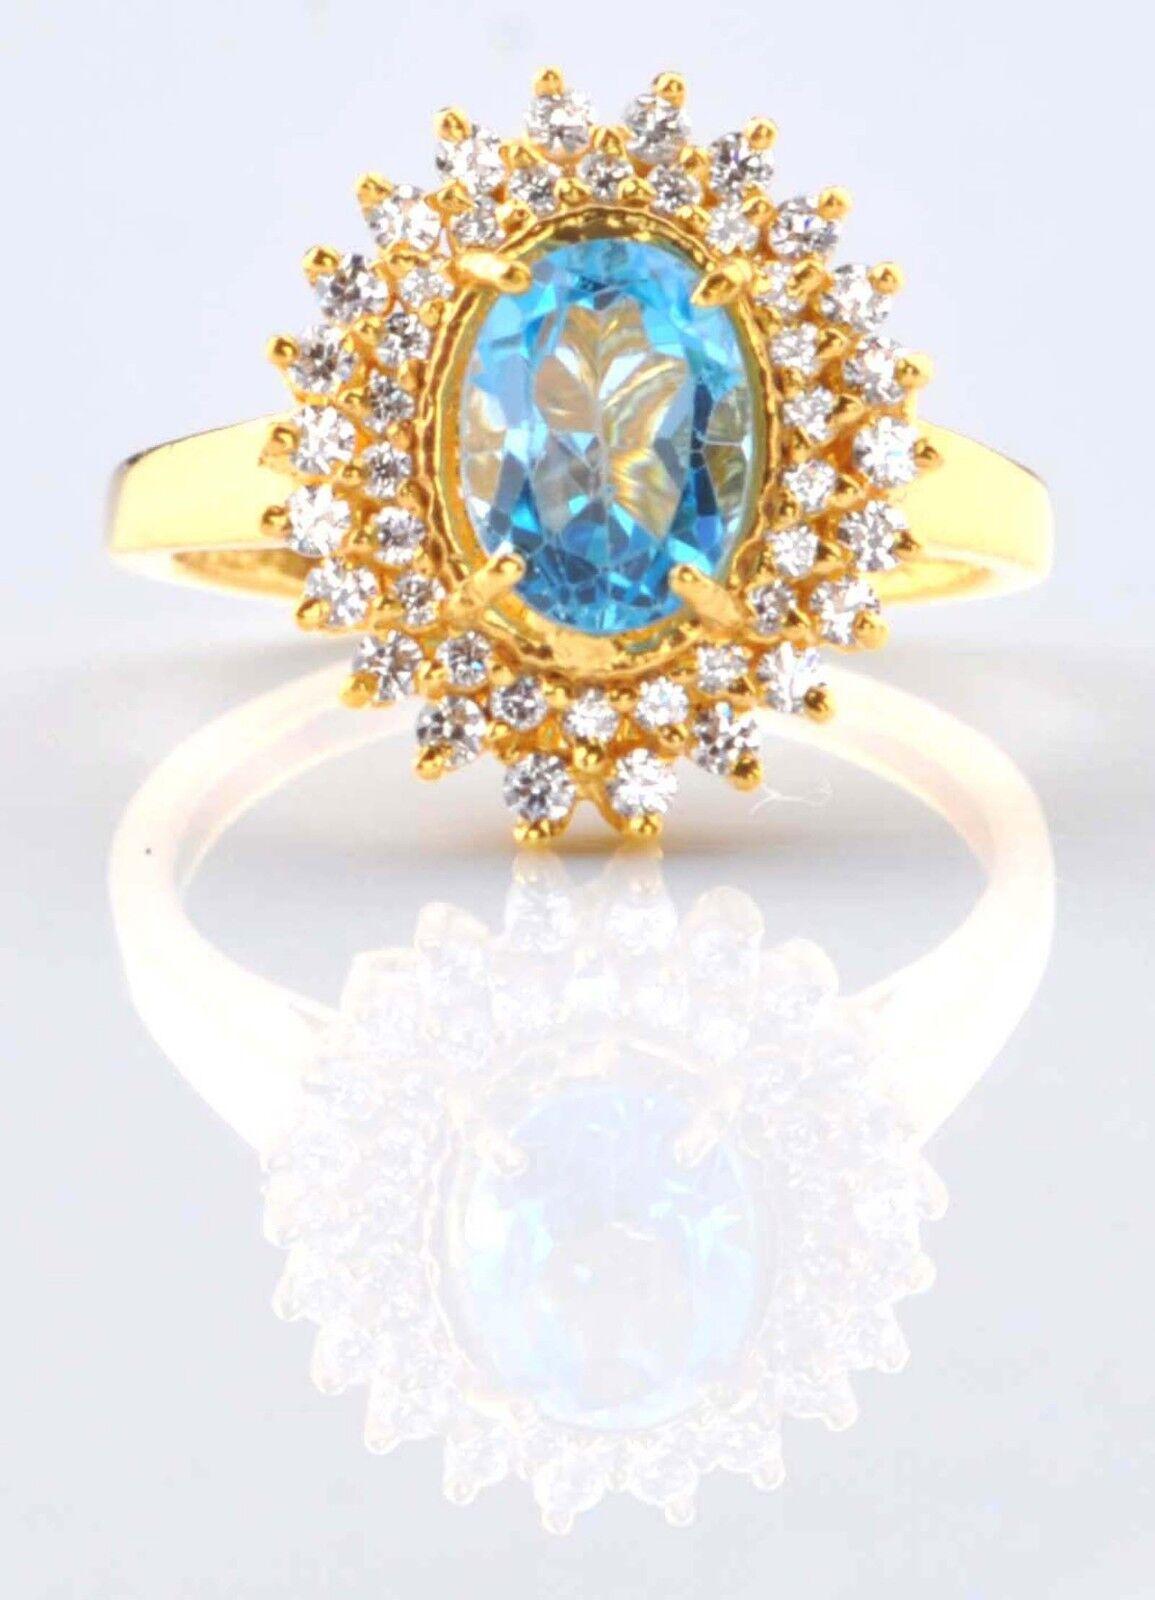 14KT Yellow gold 2.45 Carat Natural bluee Topaz EGL Certified Diamond Ring